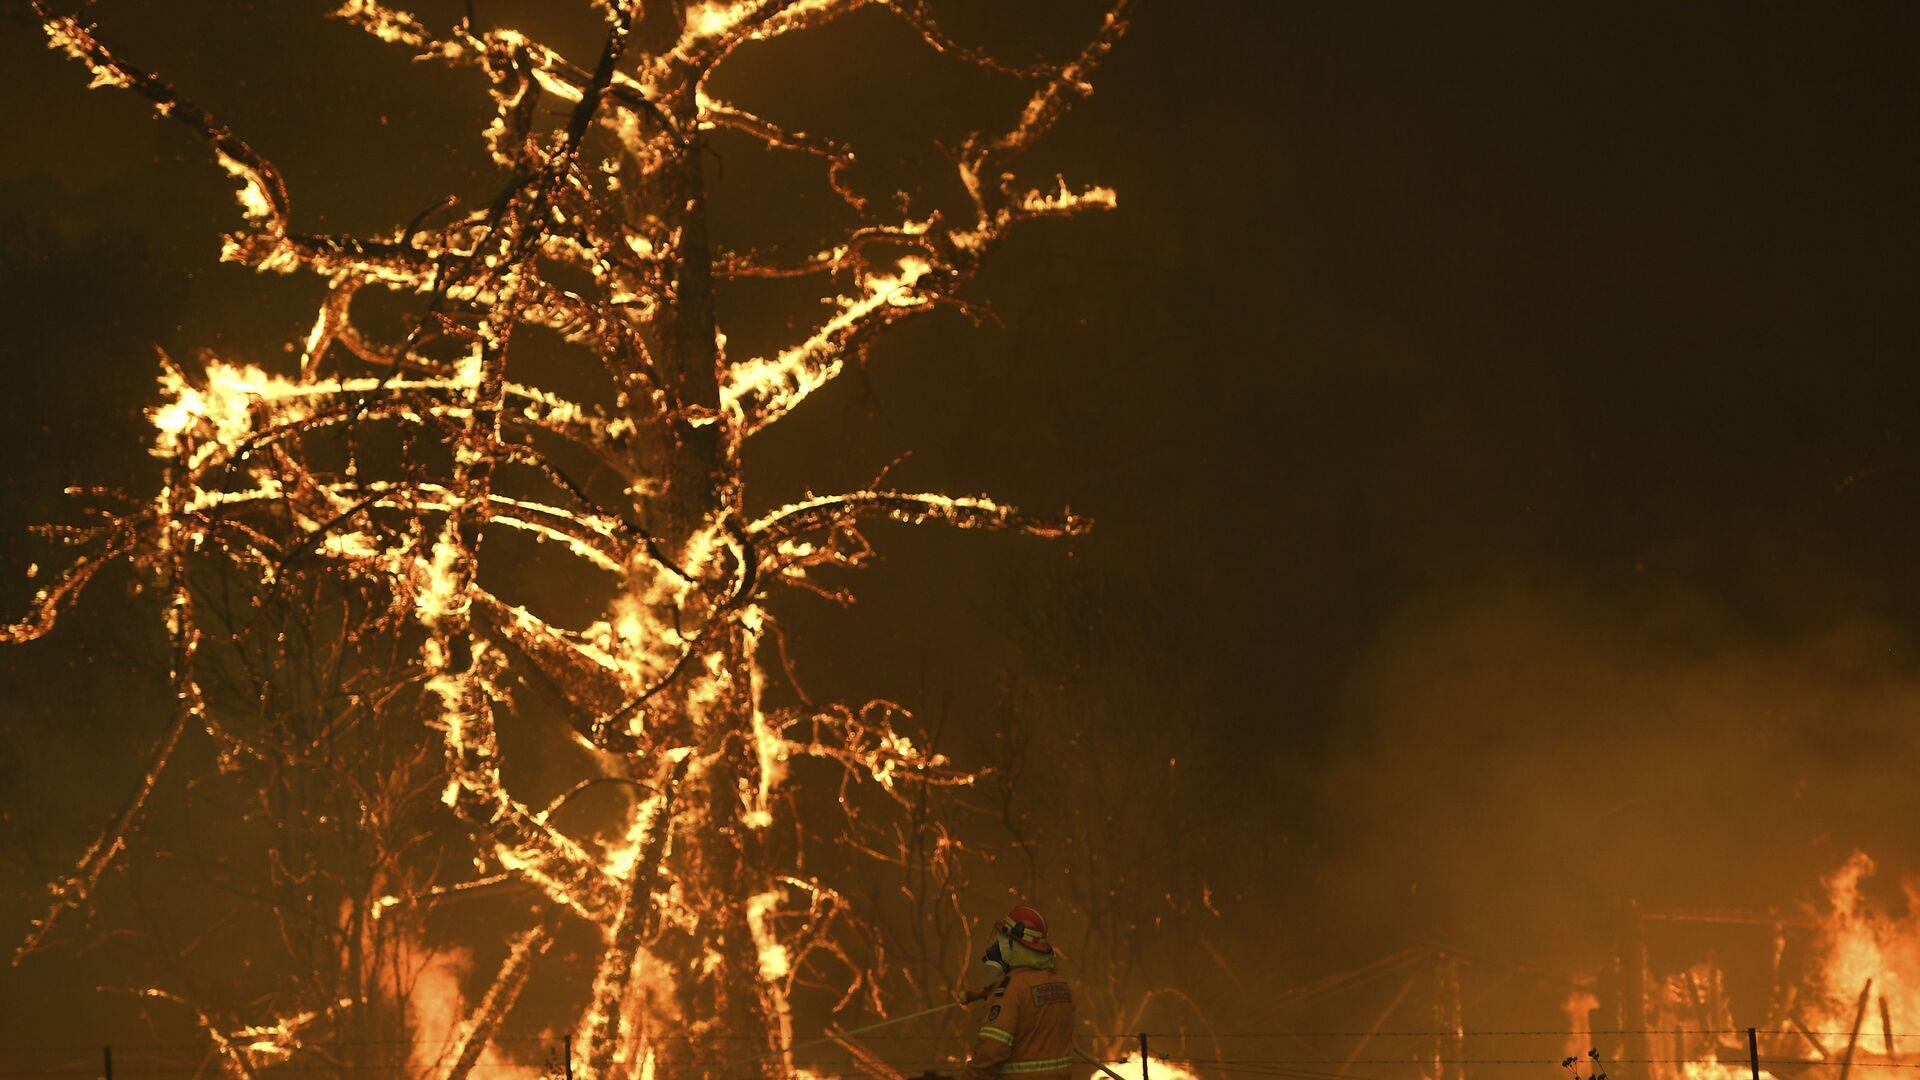 Gli incendi boschivi in Australia - Sputnik Italia, 1920, 02.07.2021